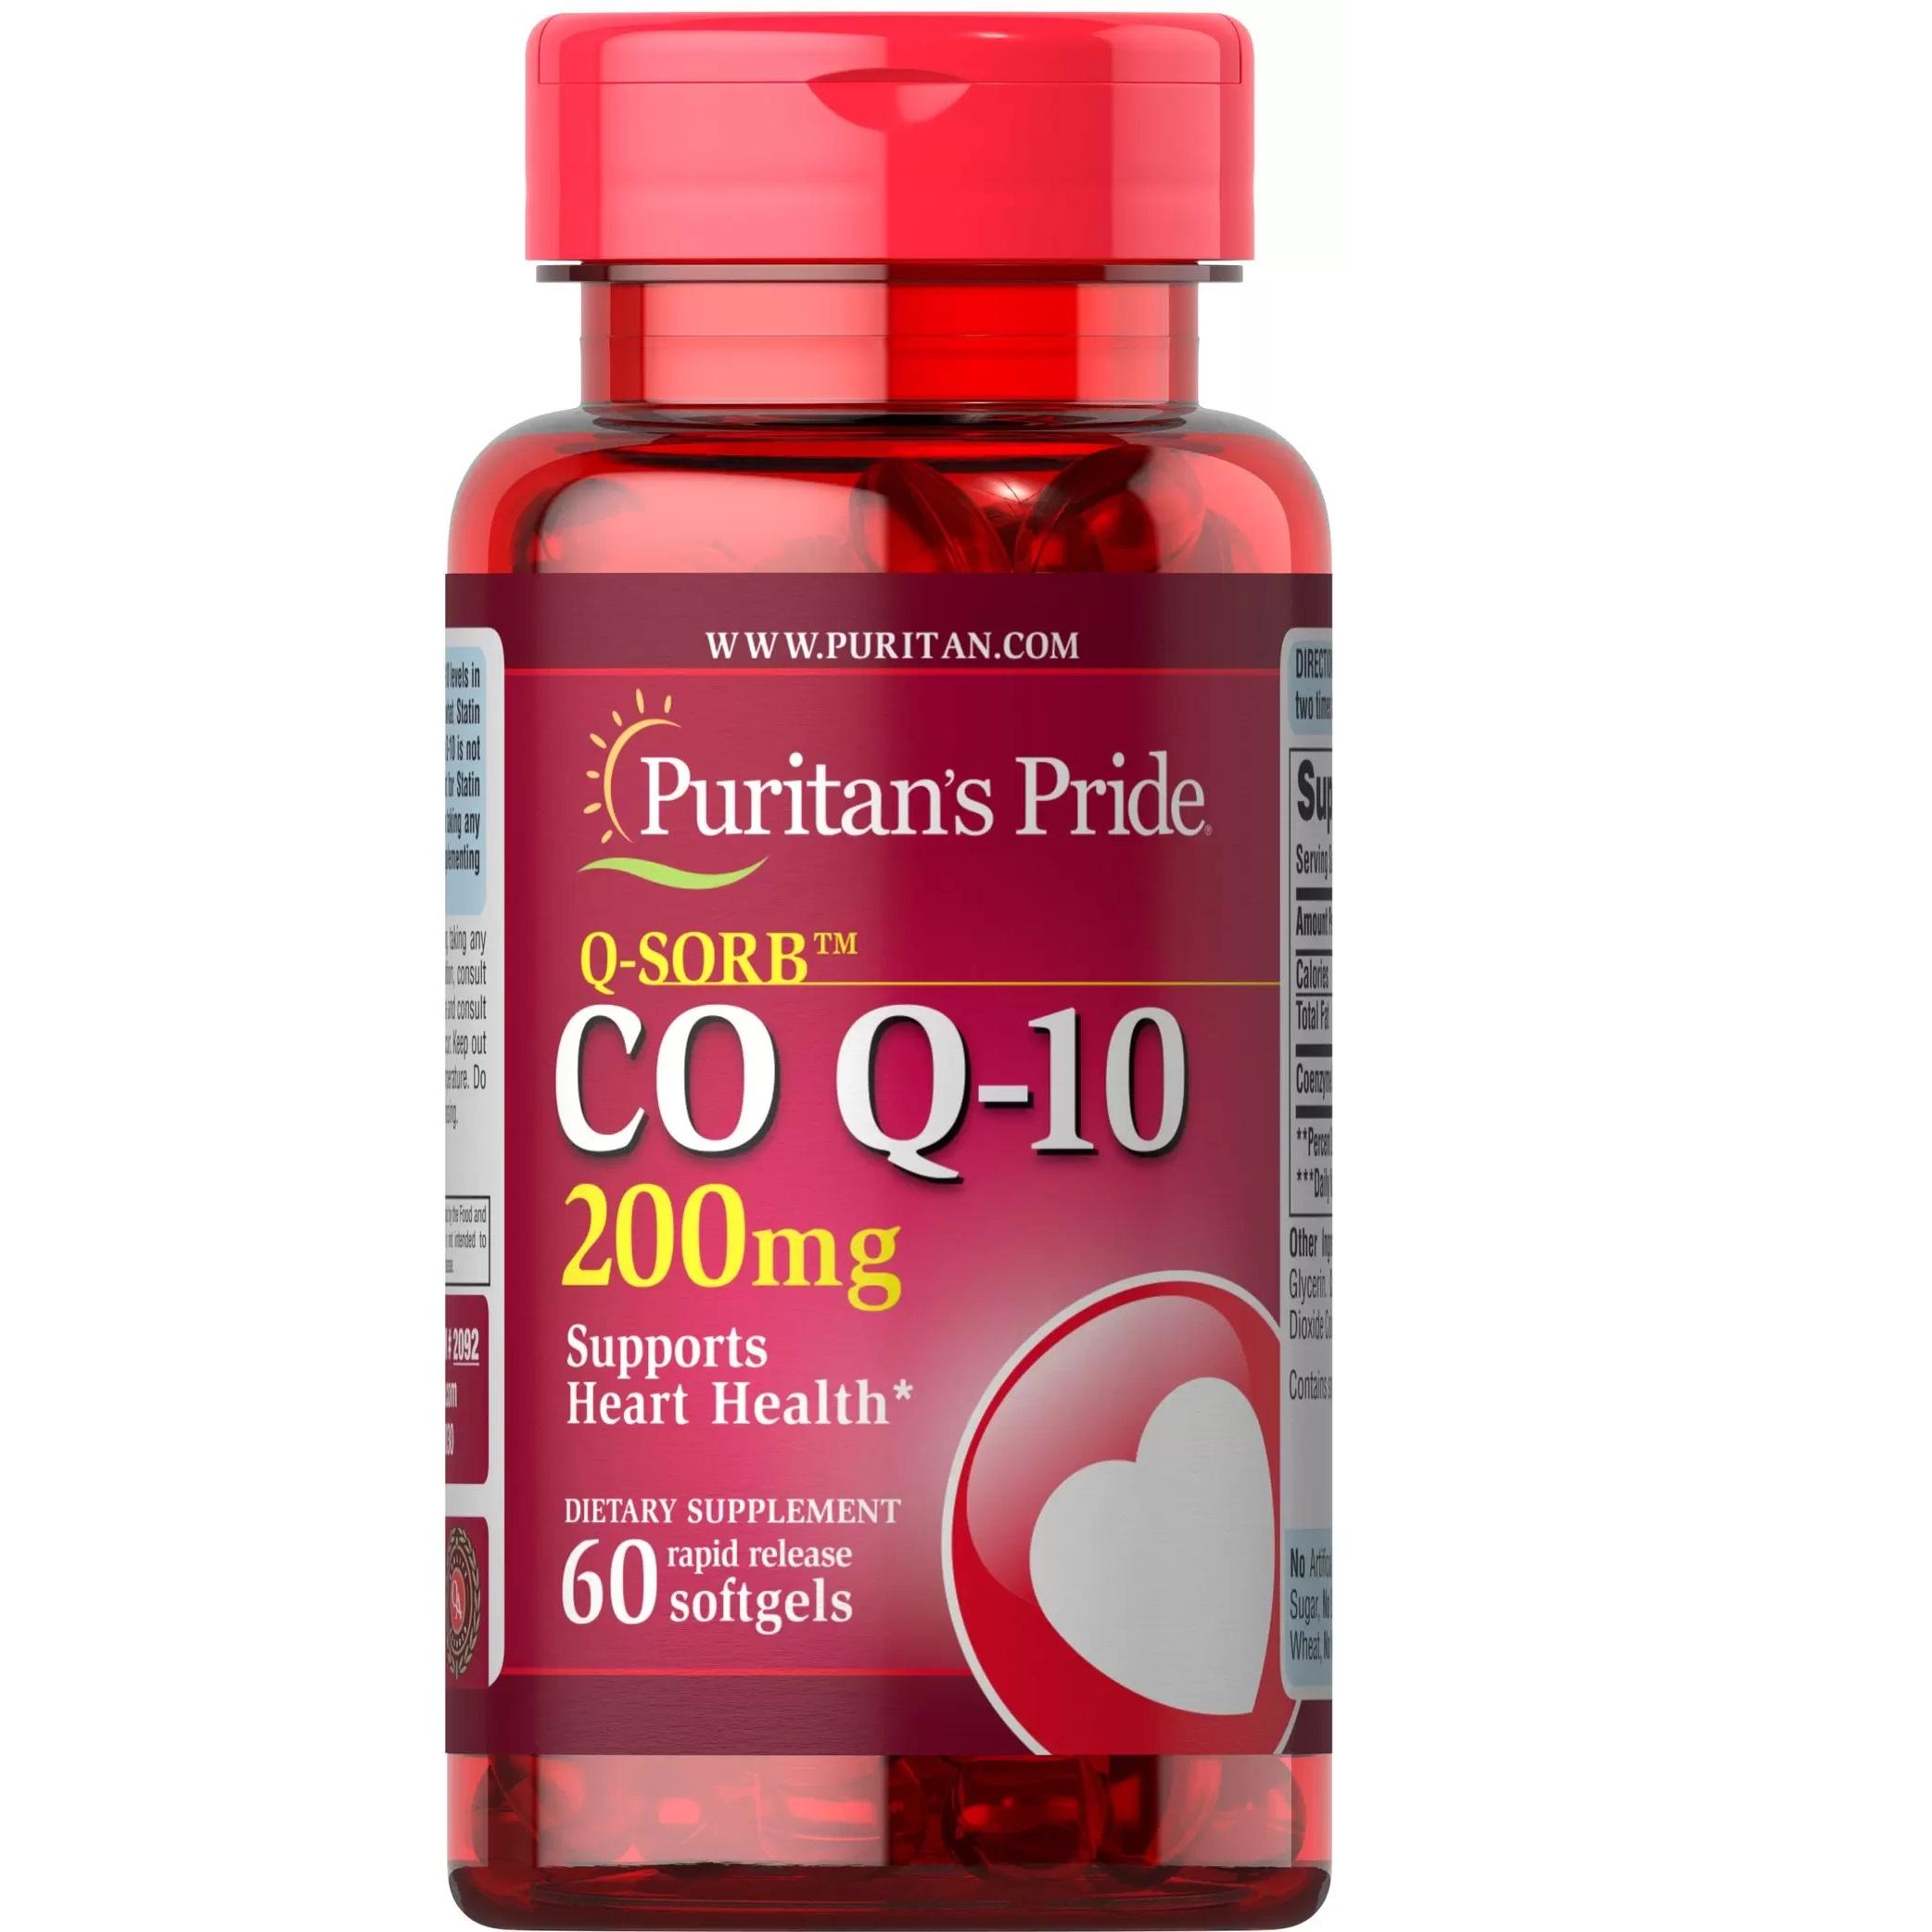 Puritan's Pride 普丽普莱:全场 Co Q-10系列产品